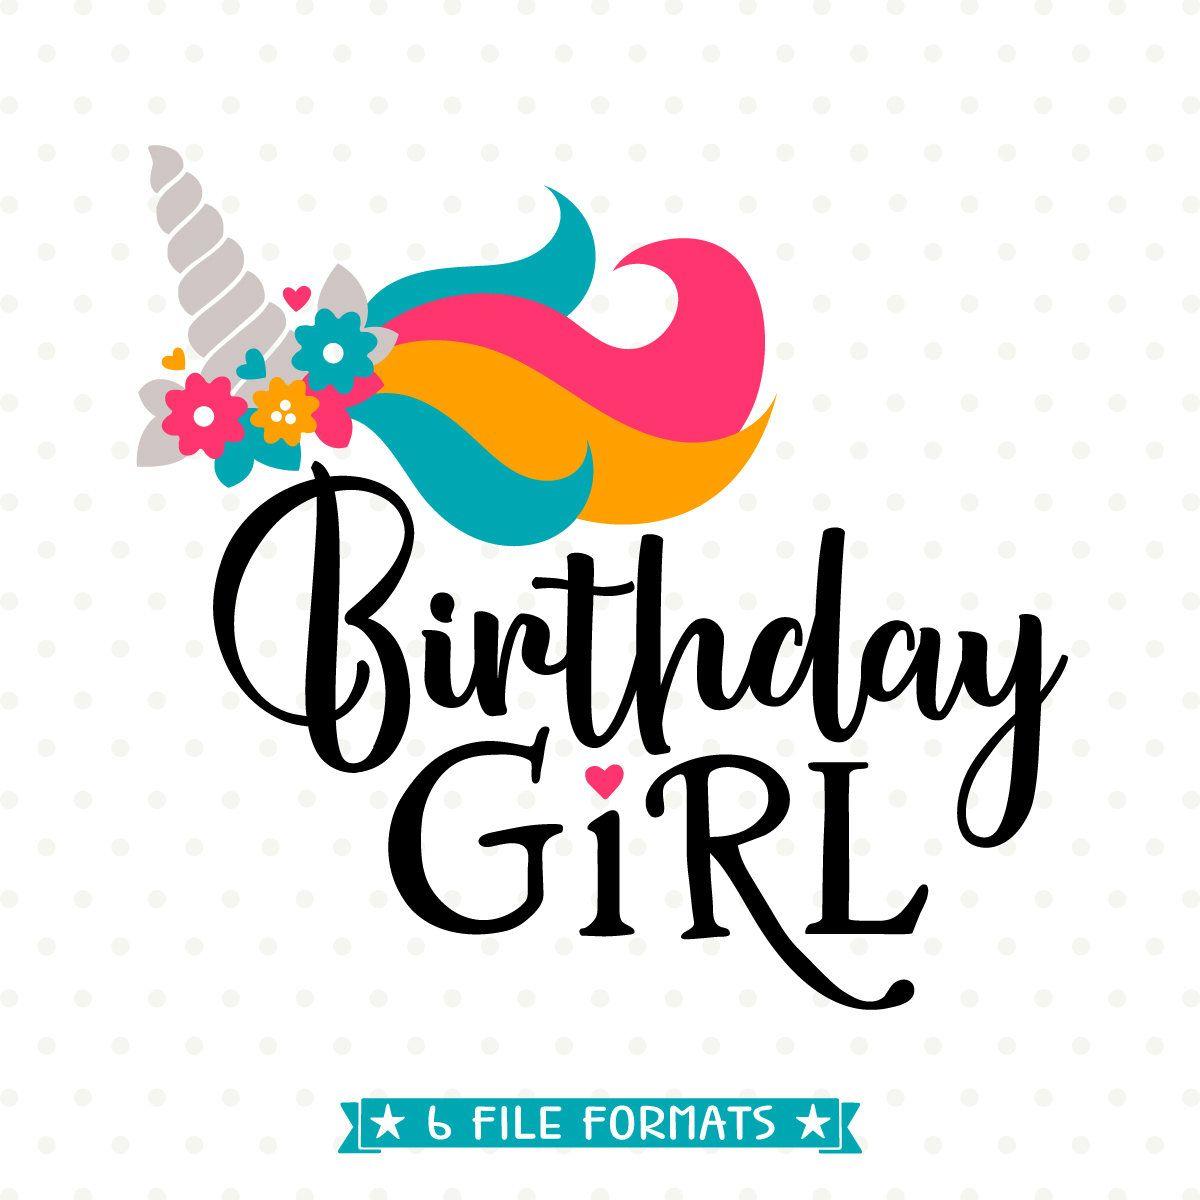 Birthday Girl Quotes: Birthday Girl SVG, Unicorn Birthday SVG, Unicorn Iron On